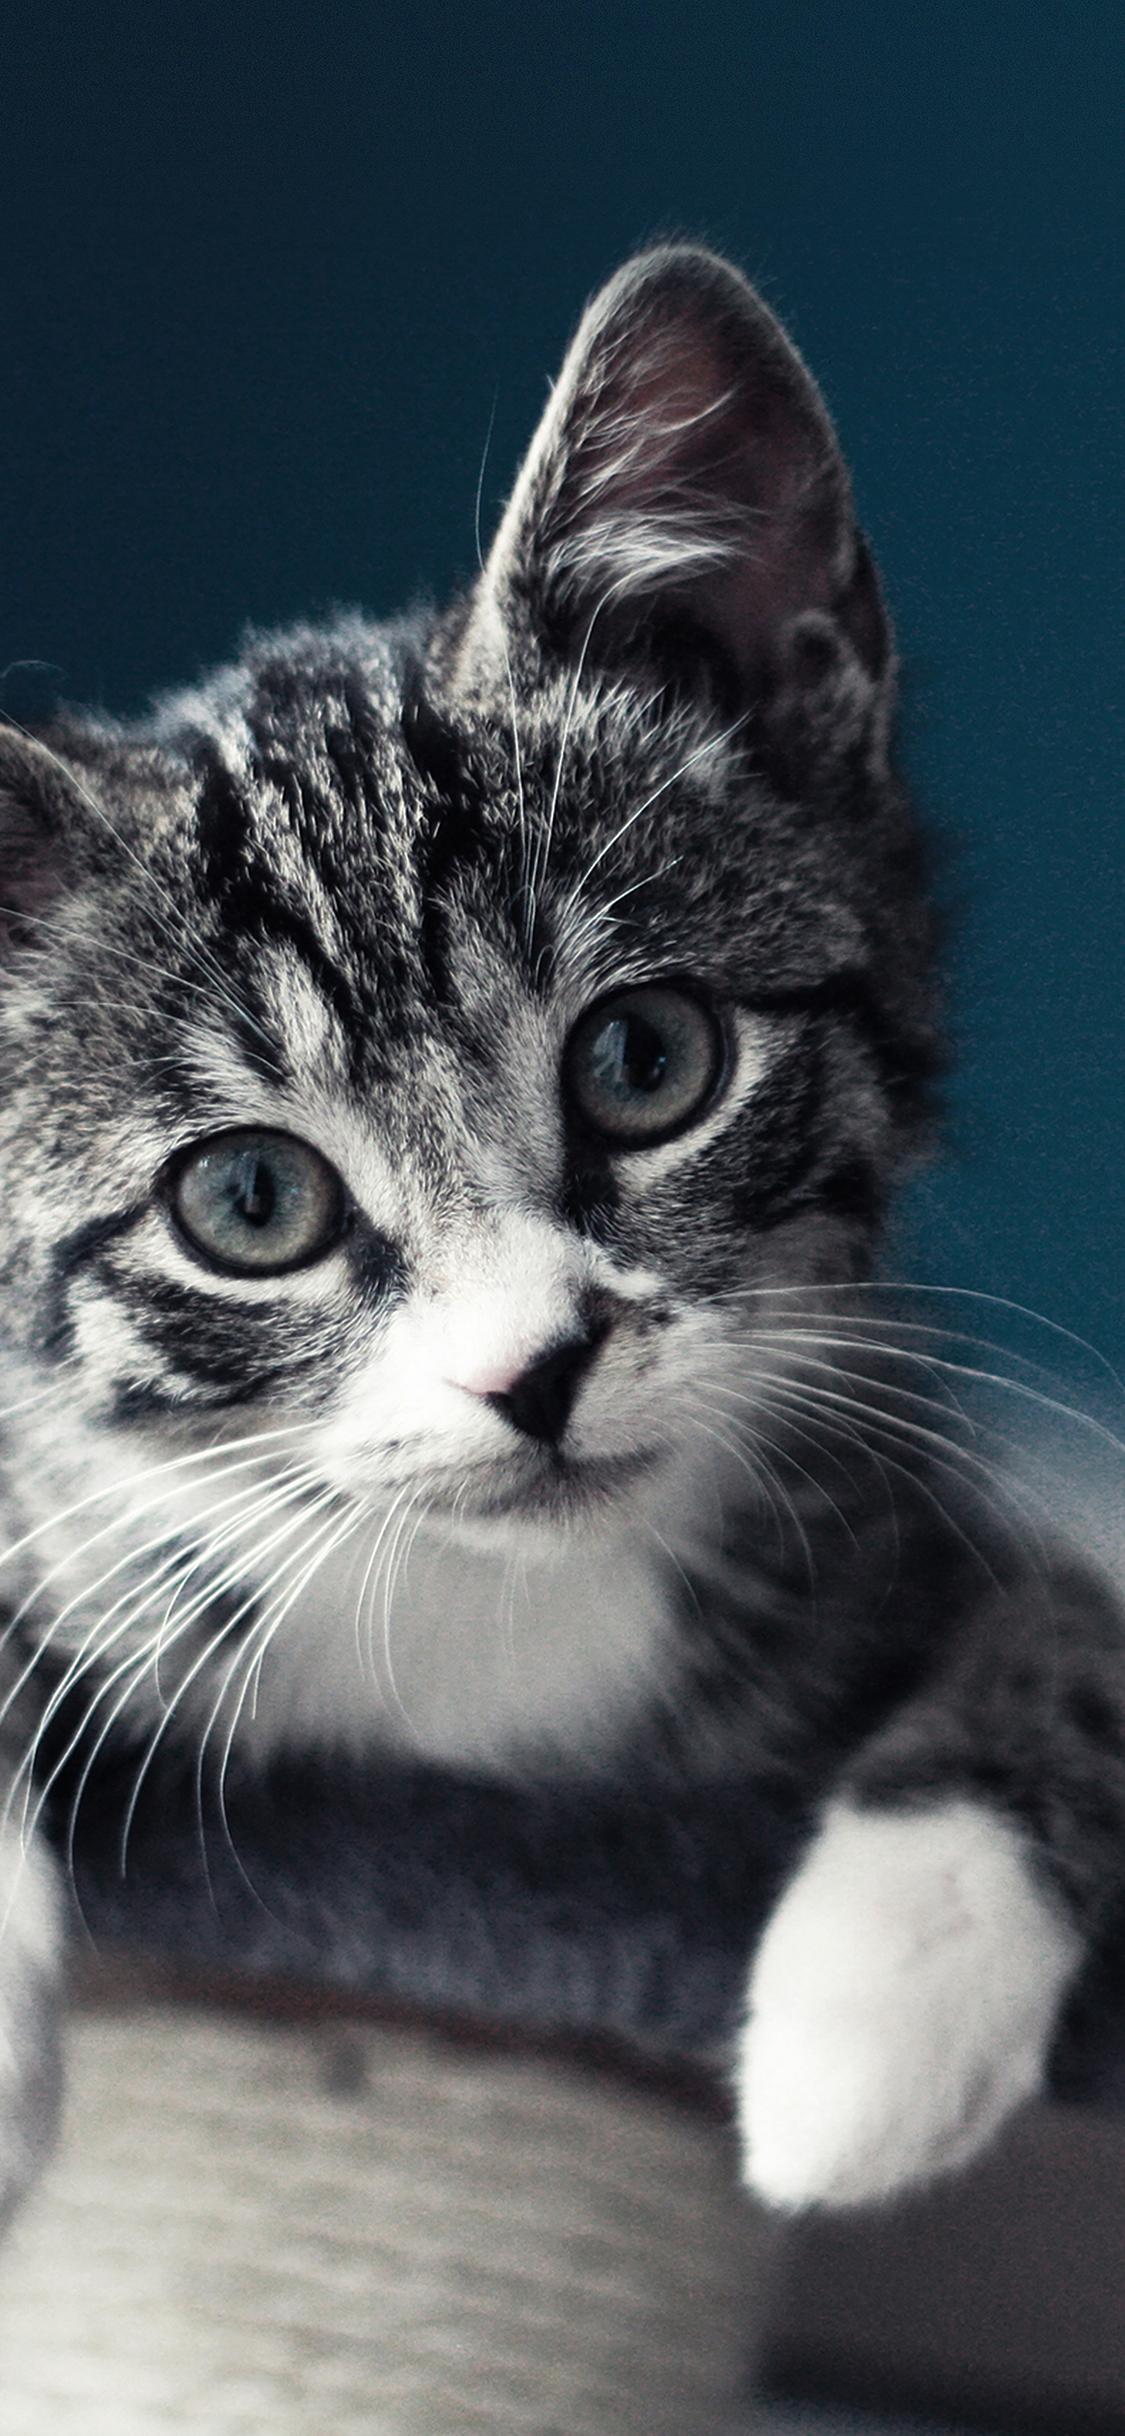 iPhoneXpapers.com-Apple-iPhone-wallpaper-mi35-cute-cat-look-animal-love-nature